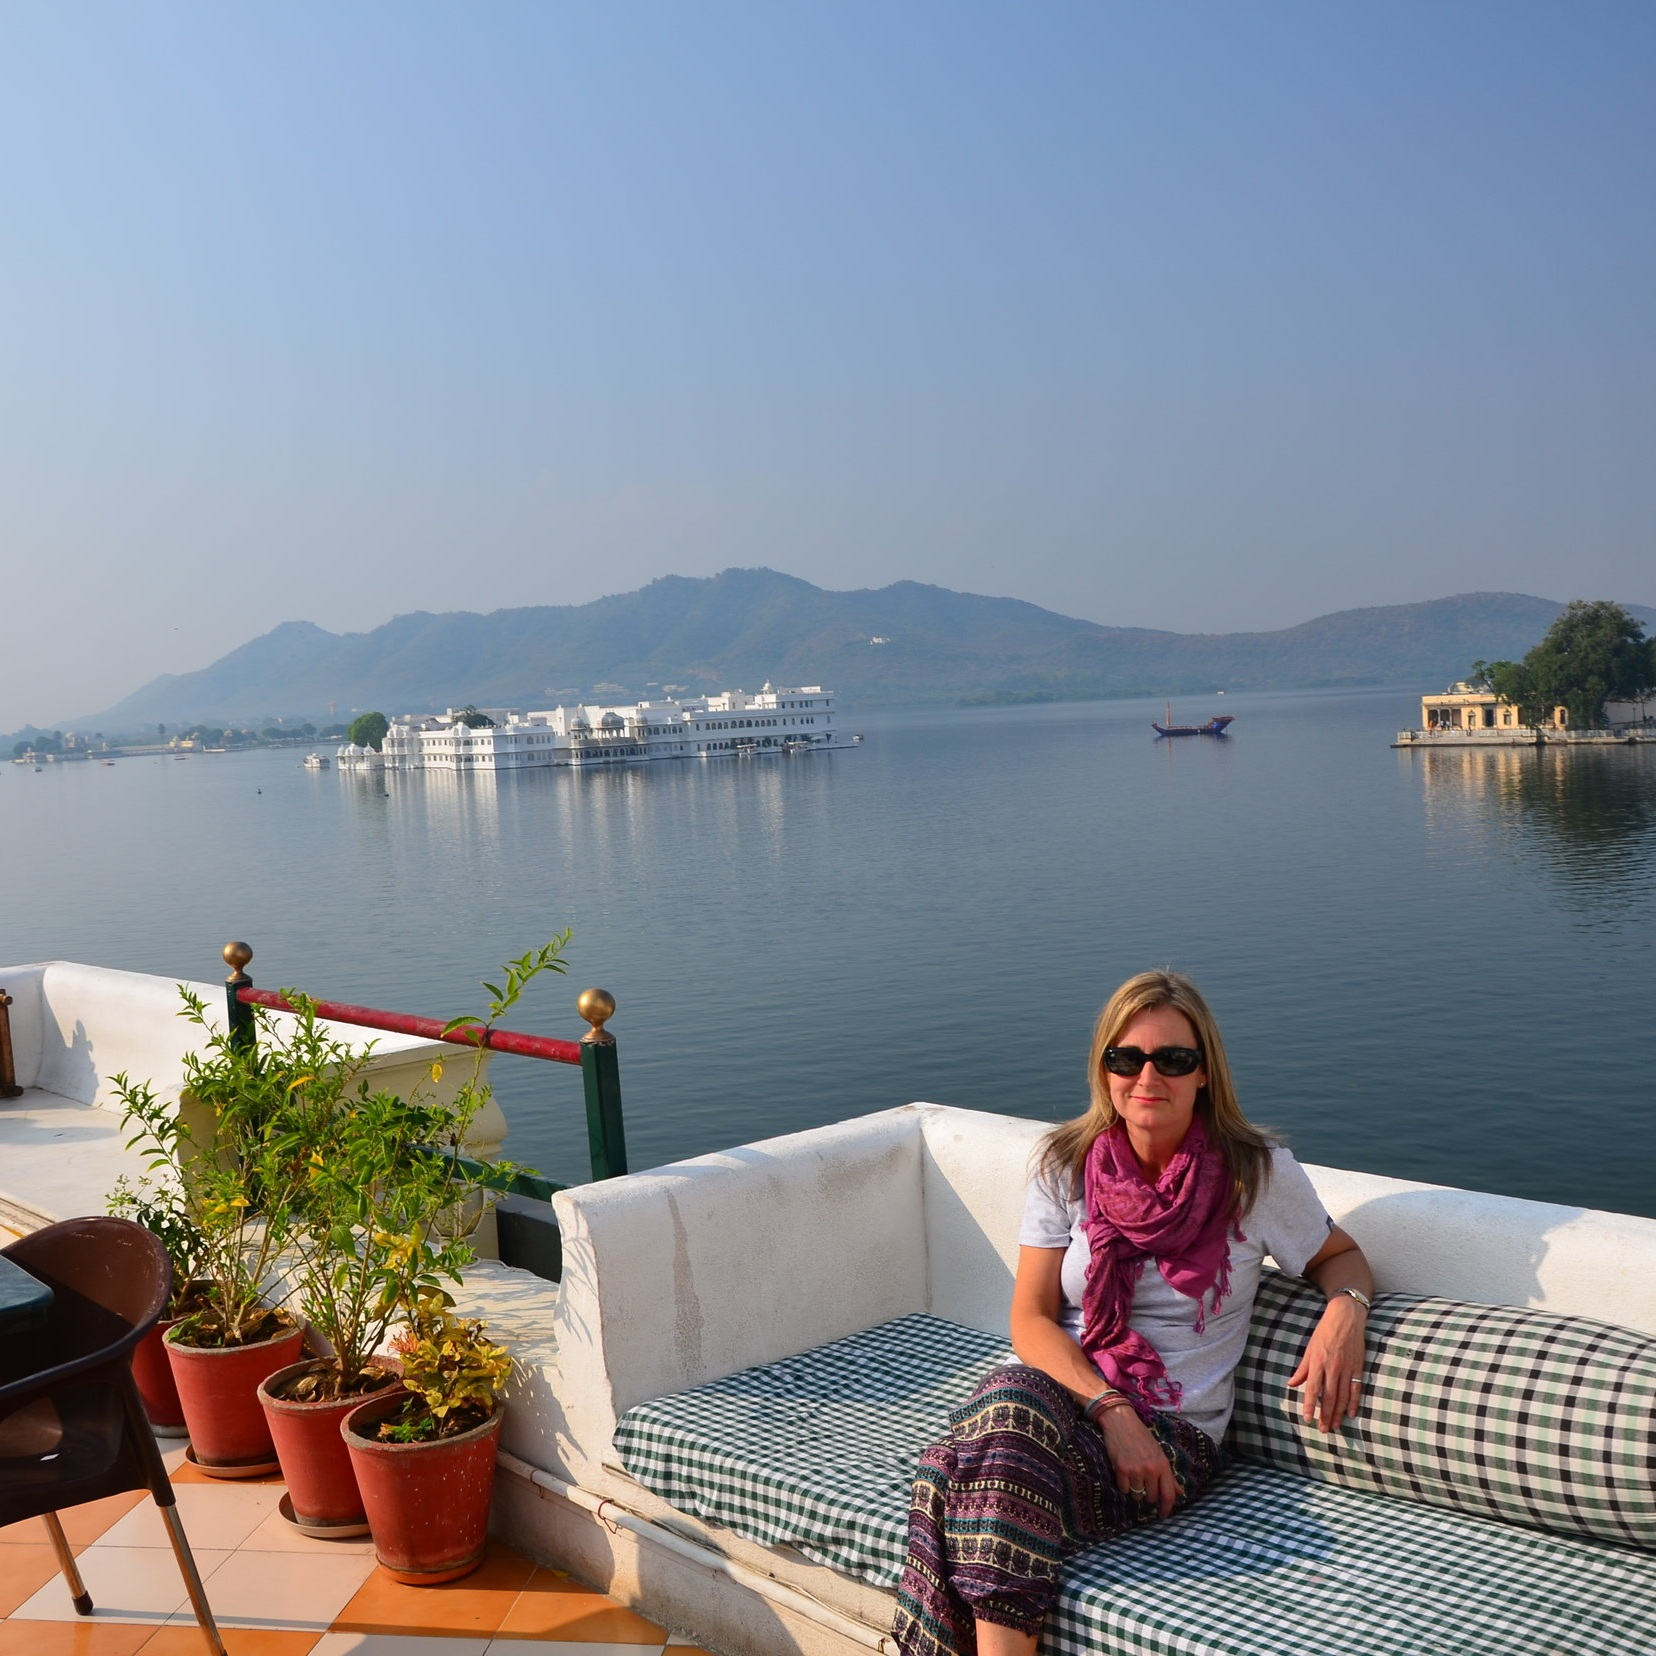 Angela+with+Lake+Pichola+and+the+Taj+Lake+Palace+in+the+background%2C+Udaipur%2C+India.jpg